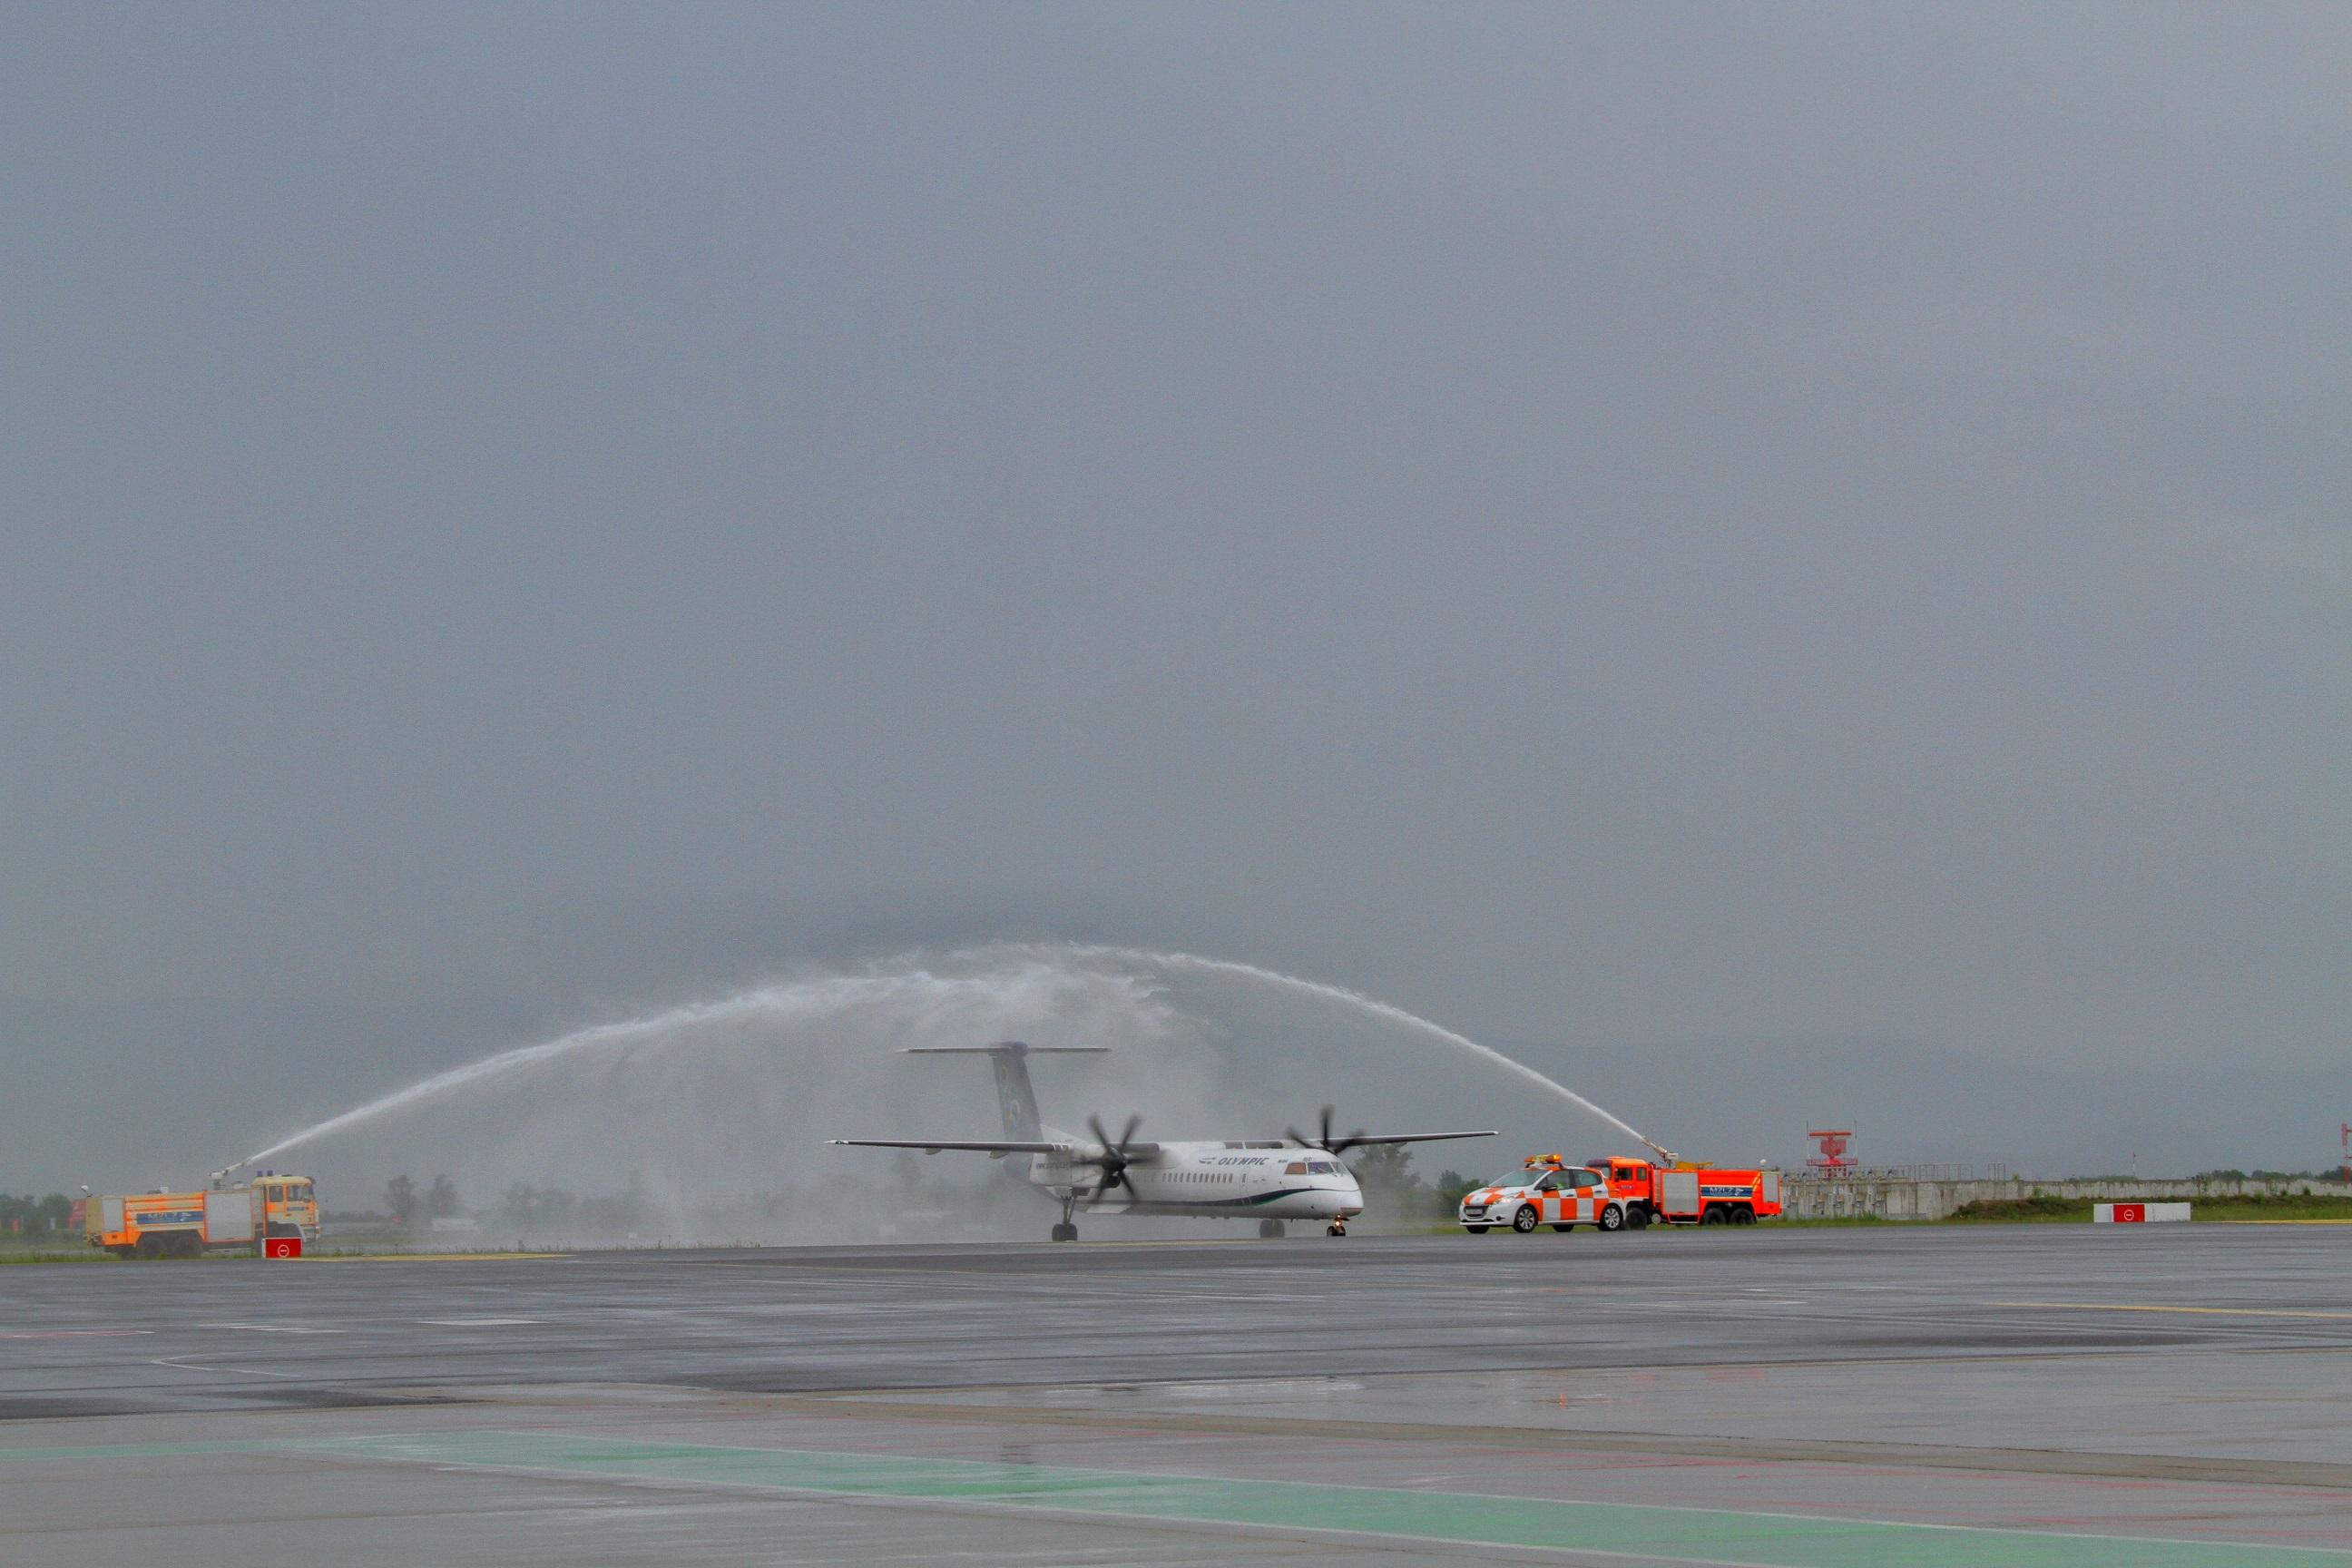 Inauguracijski let Aegean Airlinesa od Atene do Zagreba